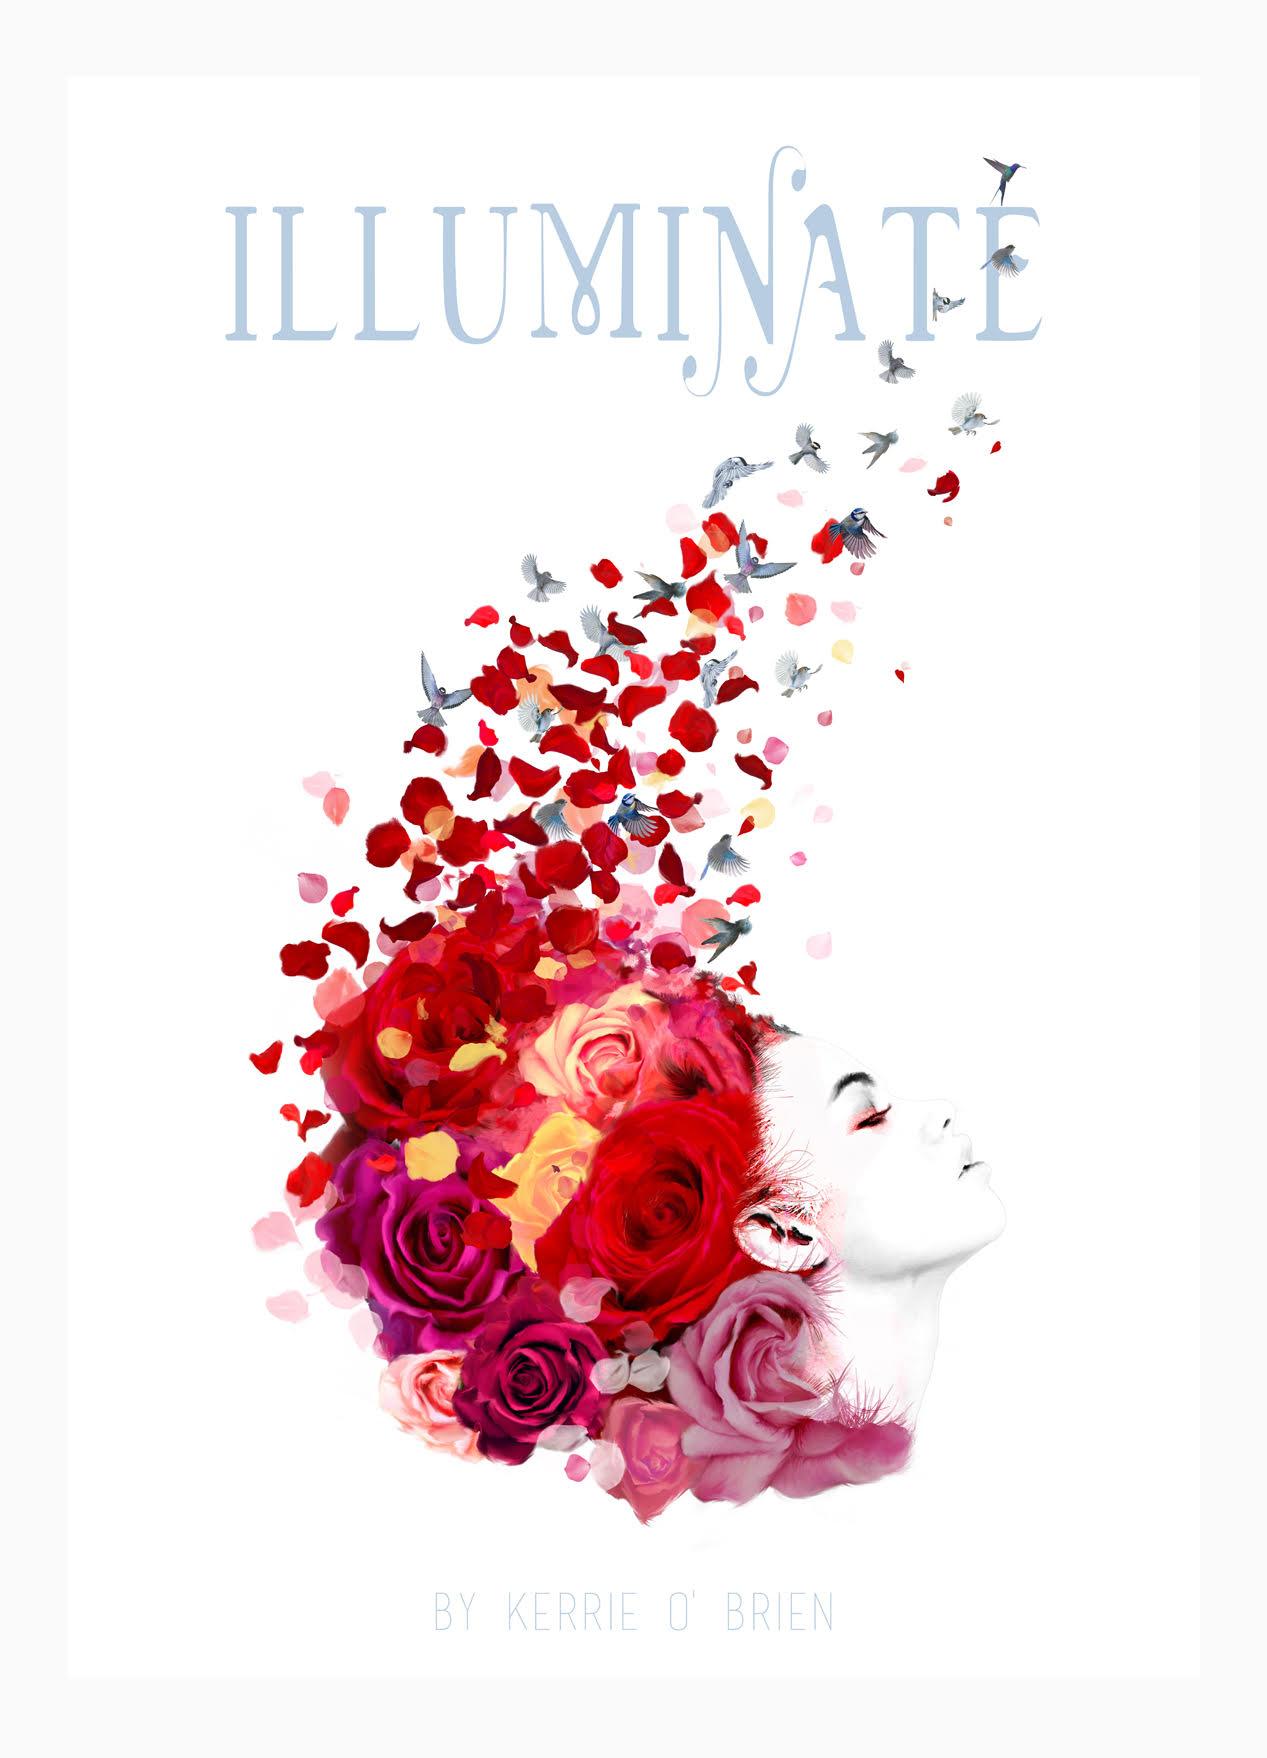 Kerrie O'Brien's Illuminate